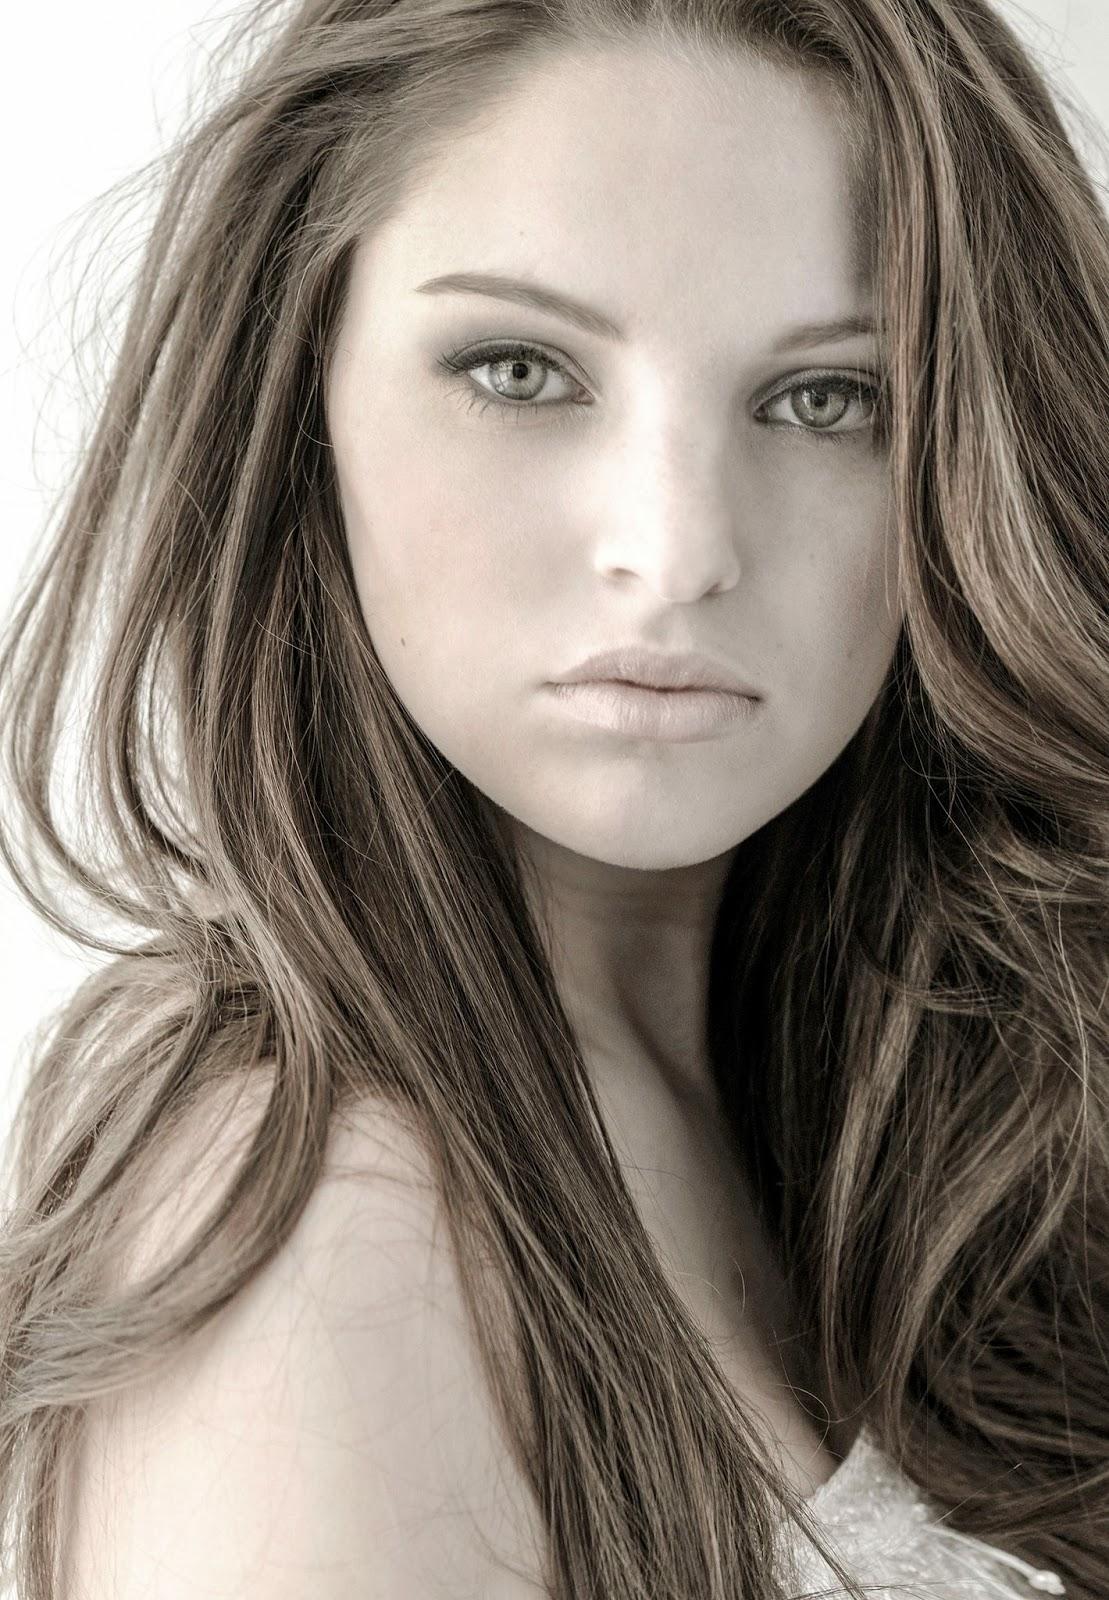 Nicole Spiller Nude Photos 1